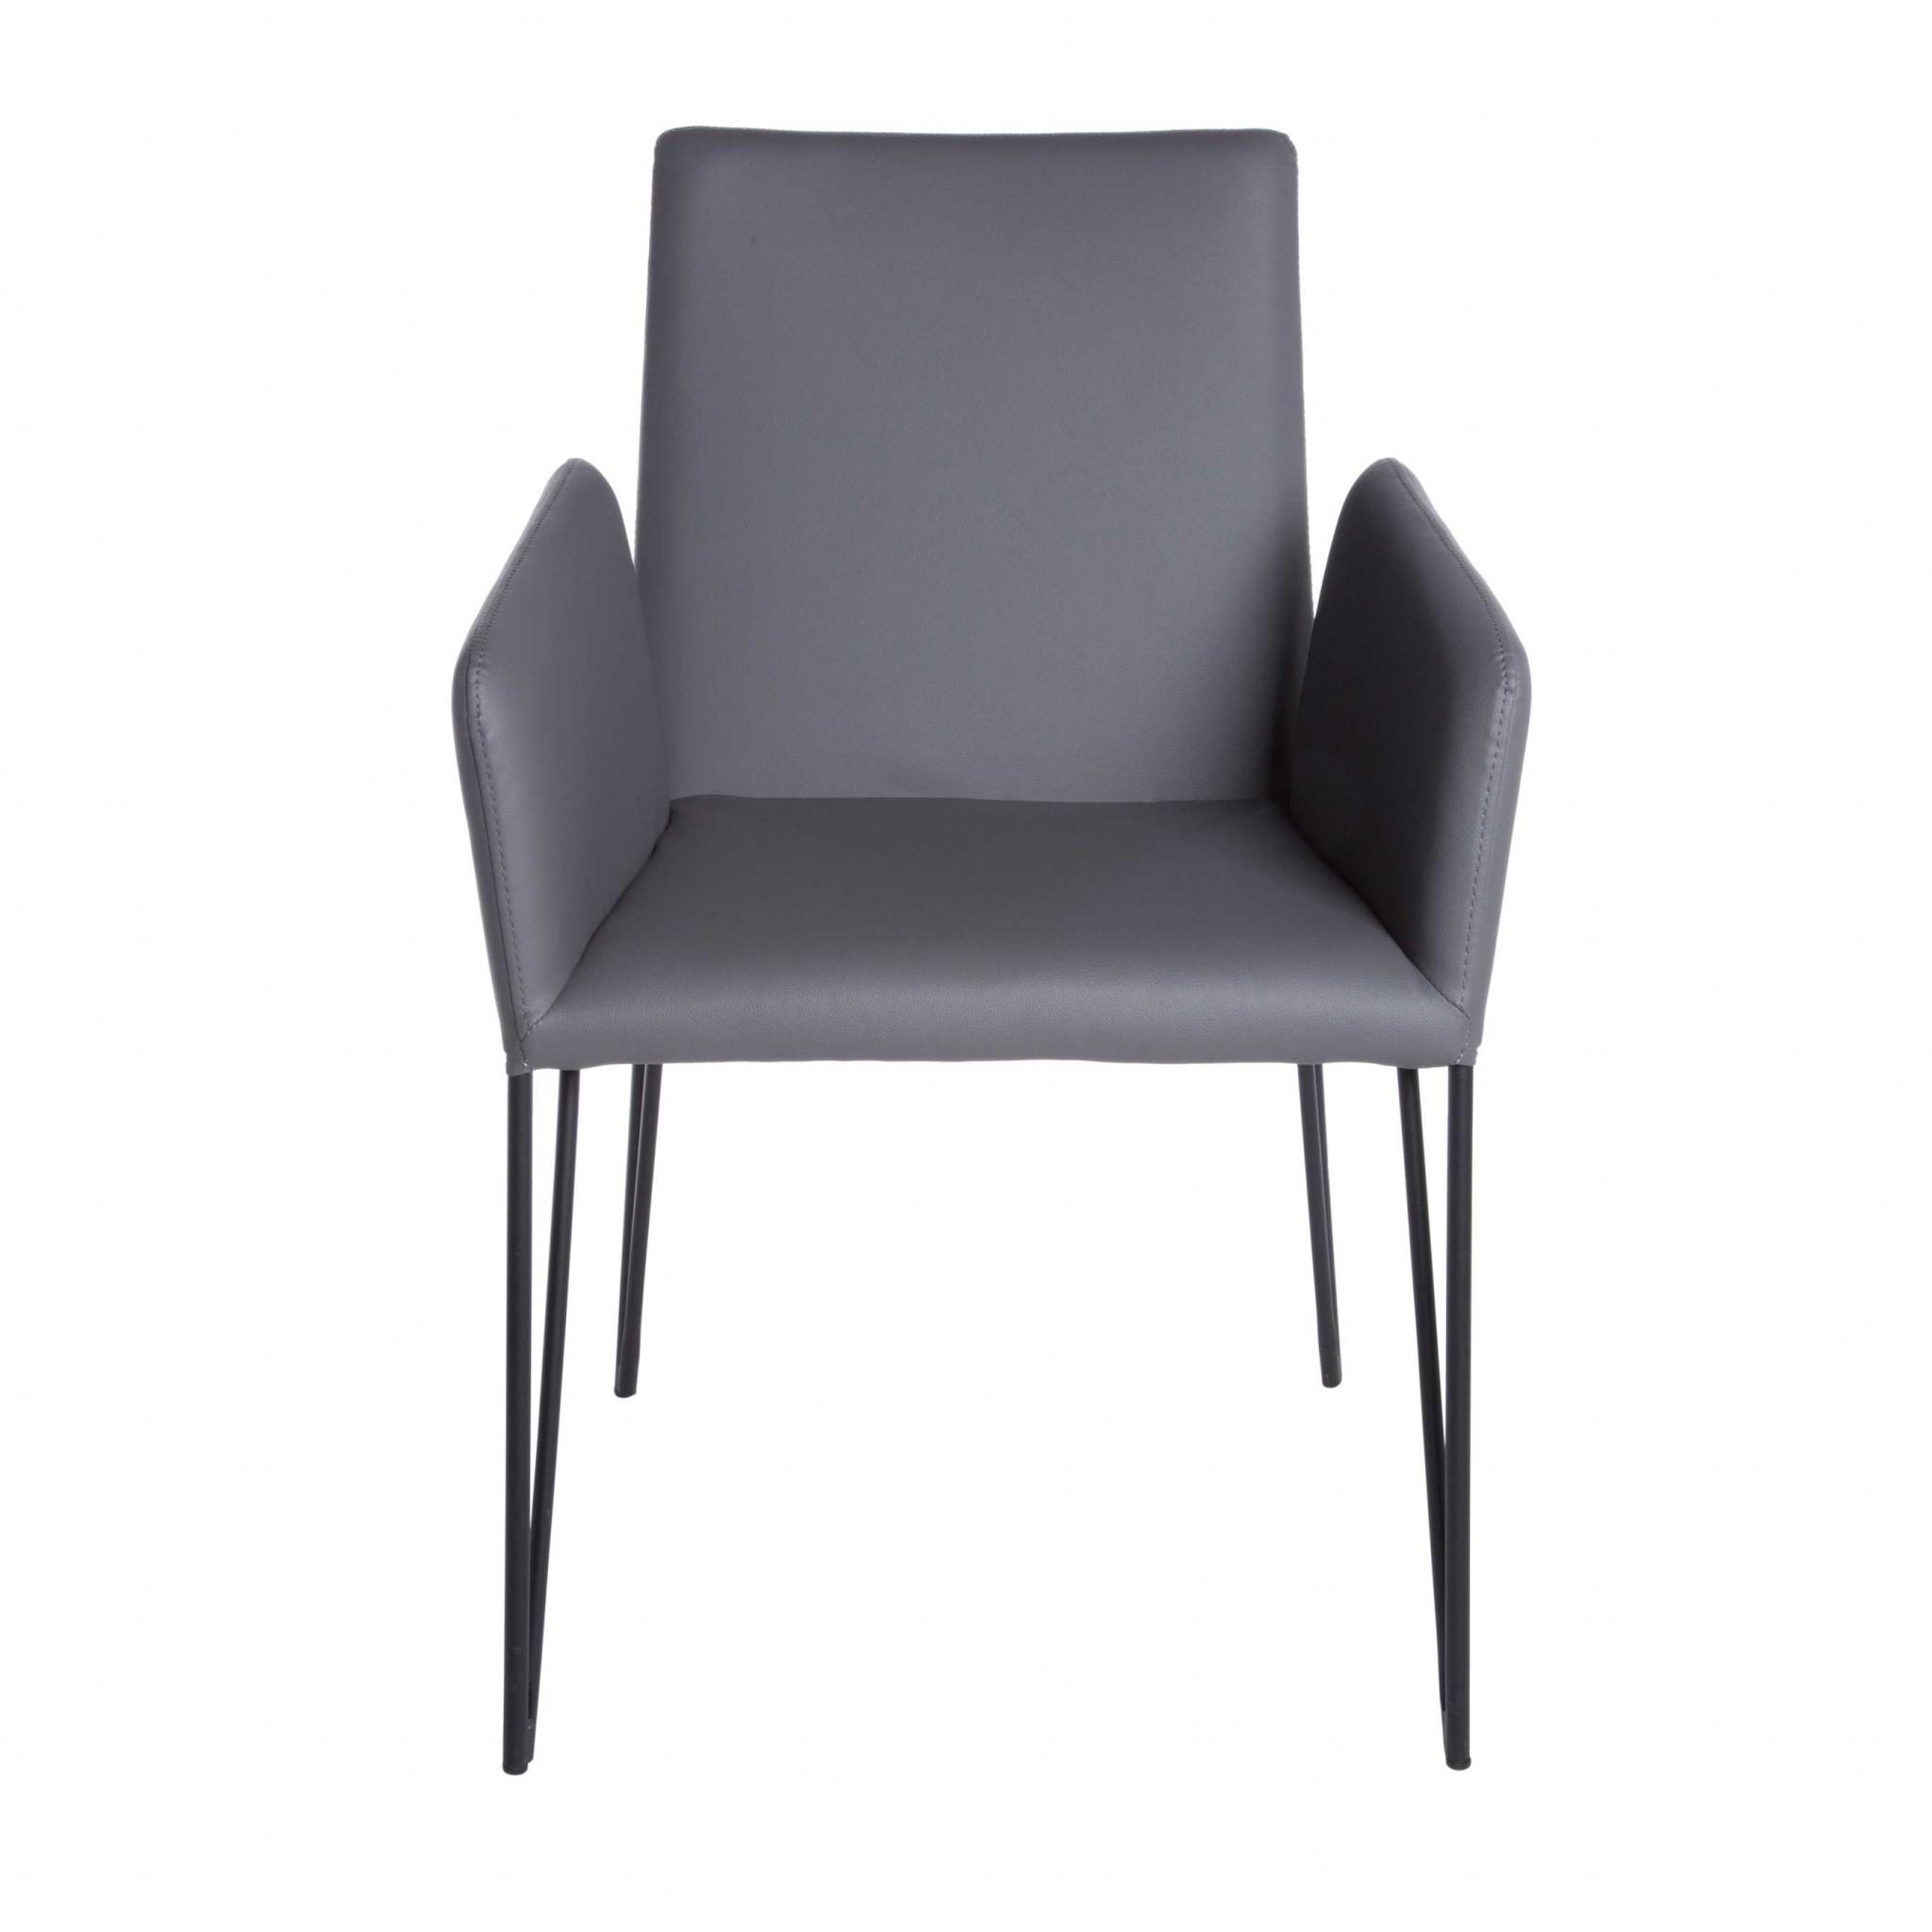 "22.45"" X 23.04"" X 35.63"" Dark Gray Leatherette over Foam Arm Chair"